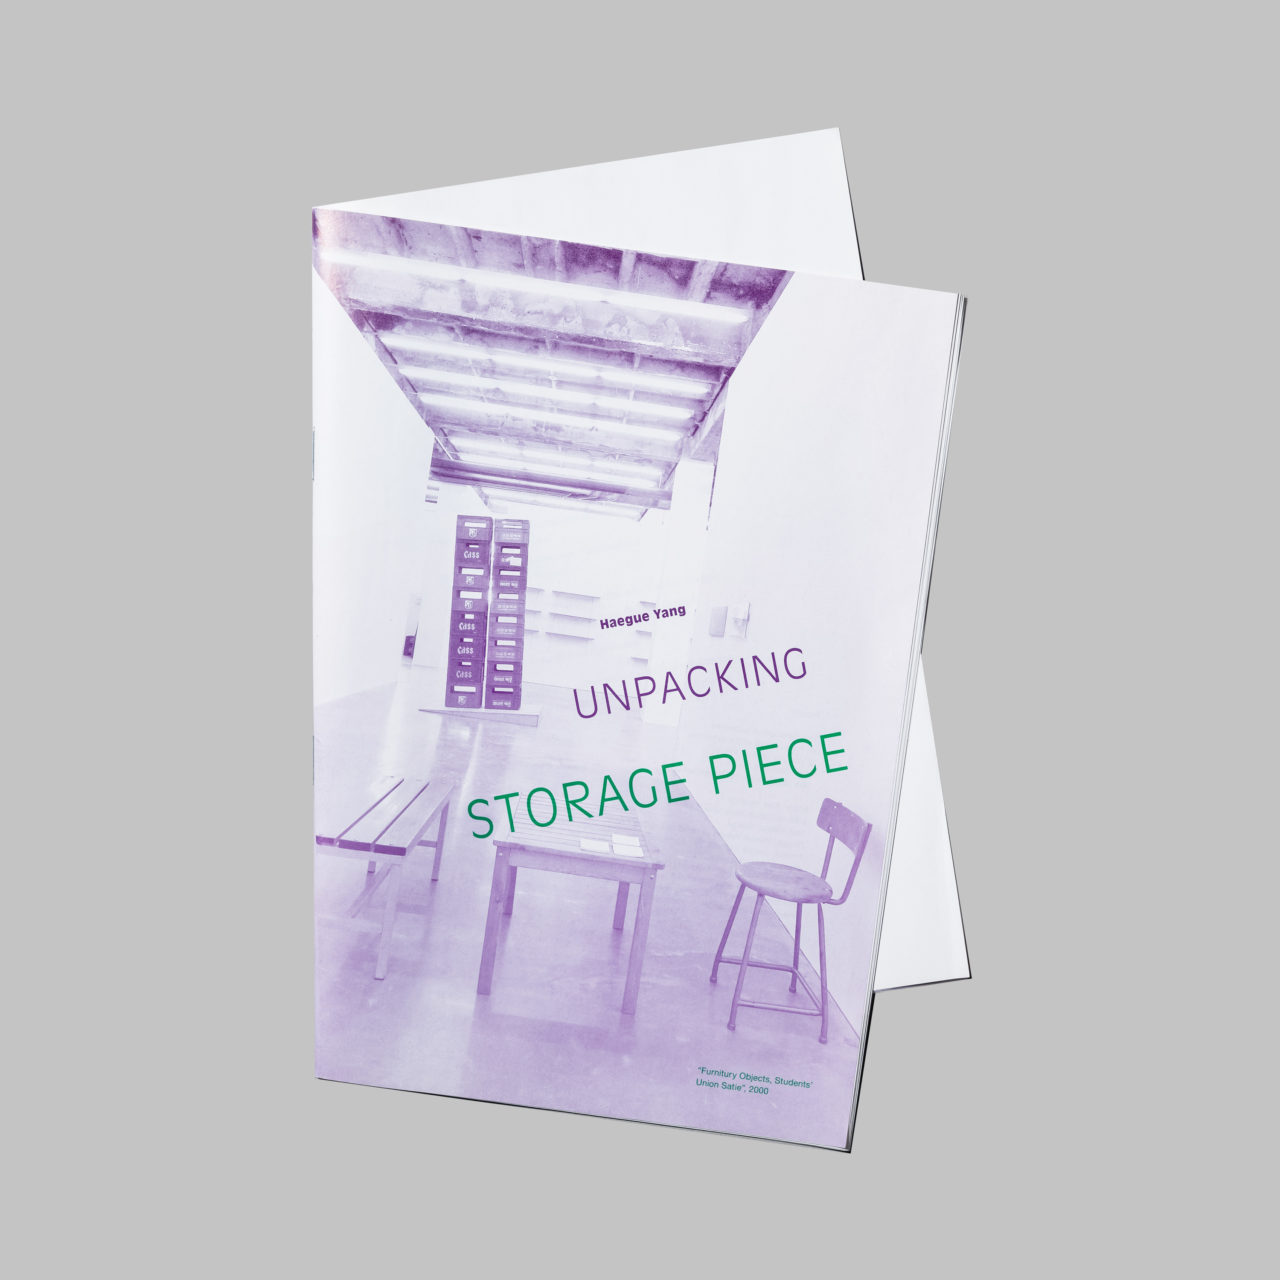 Haegue Yang: Unpacking Storage piece, Wiens Verlag (2007)